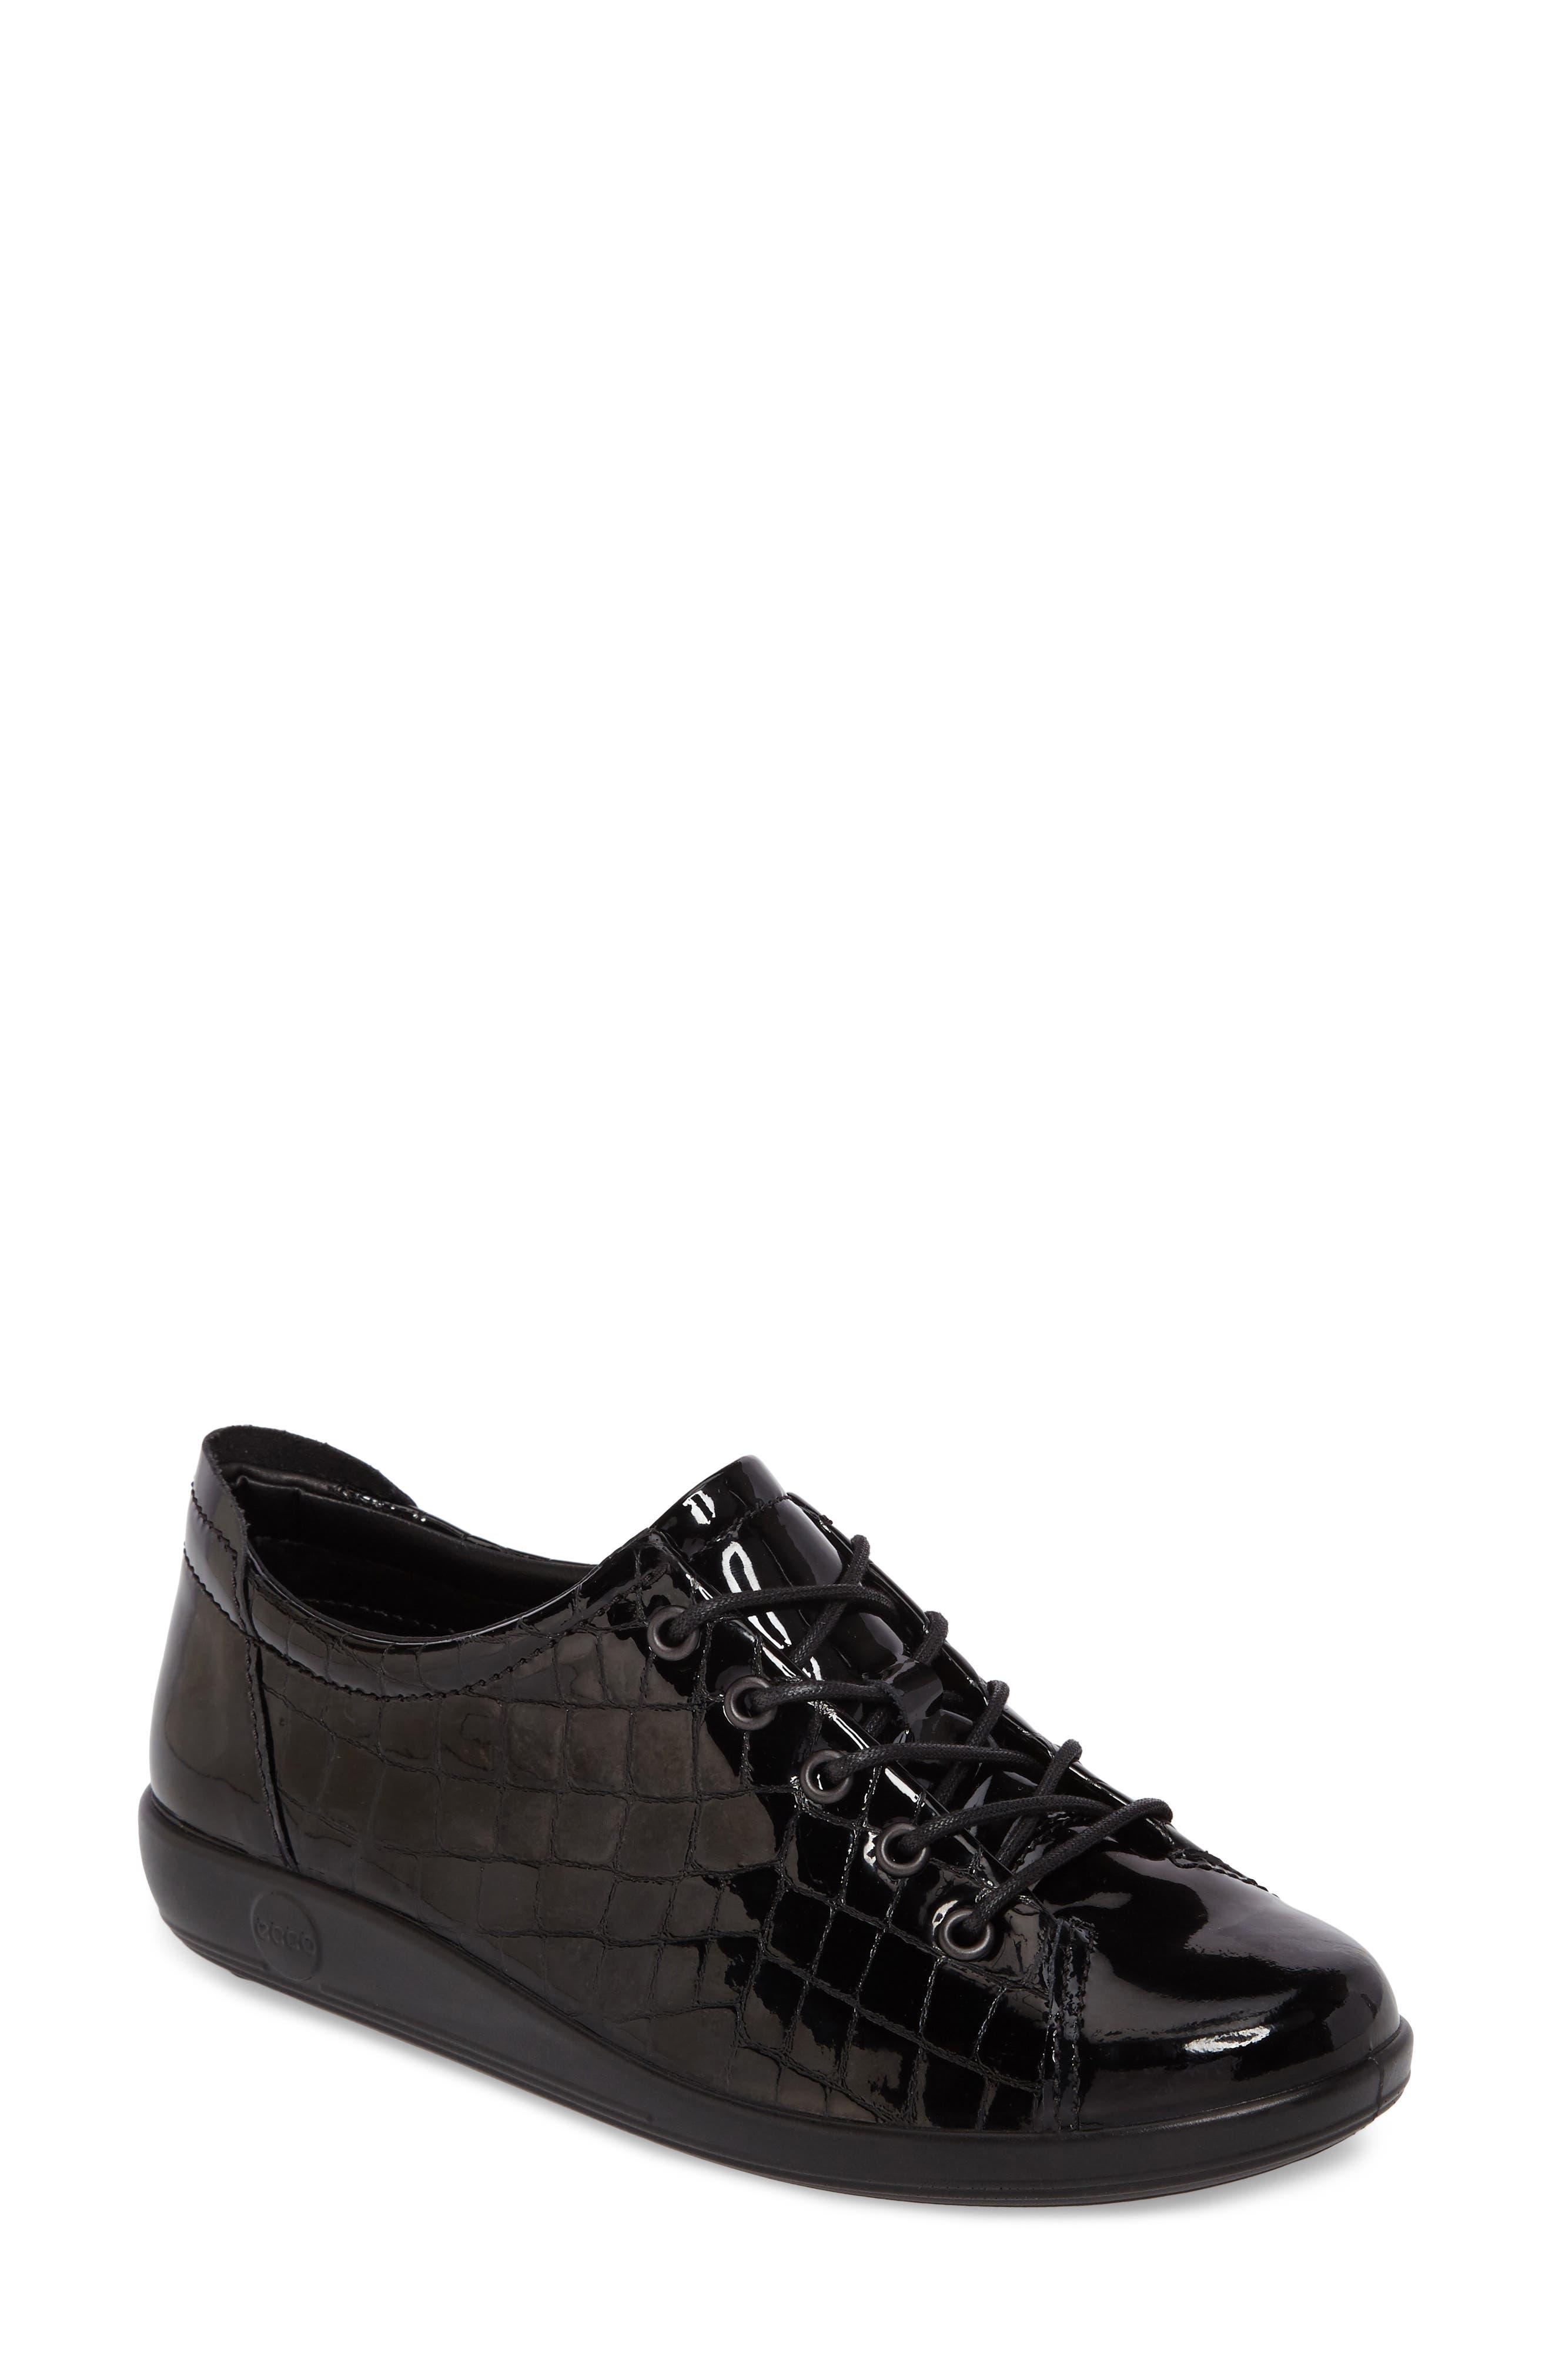 Alternate Image 1 Selected - ECCO 'Soft 2.0' Sneaker (Women)